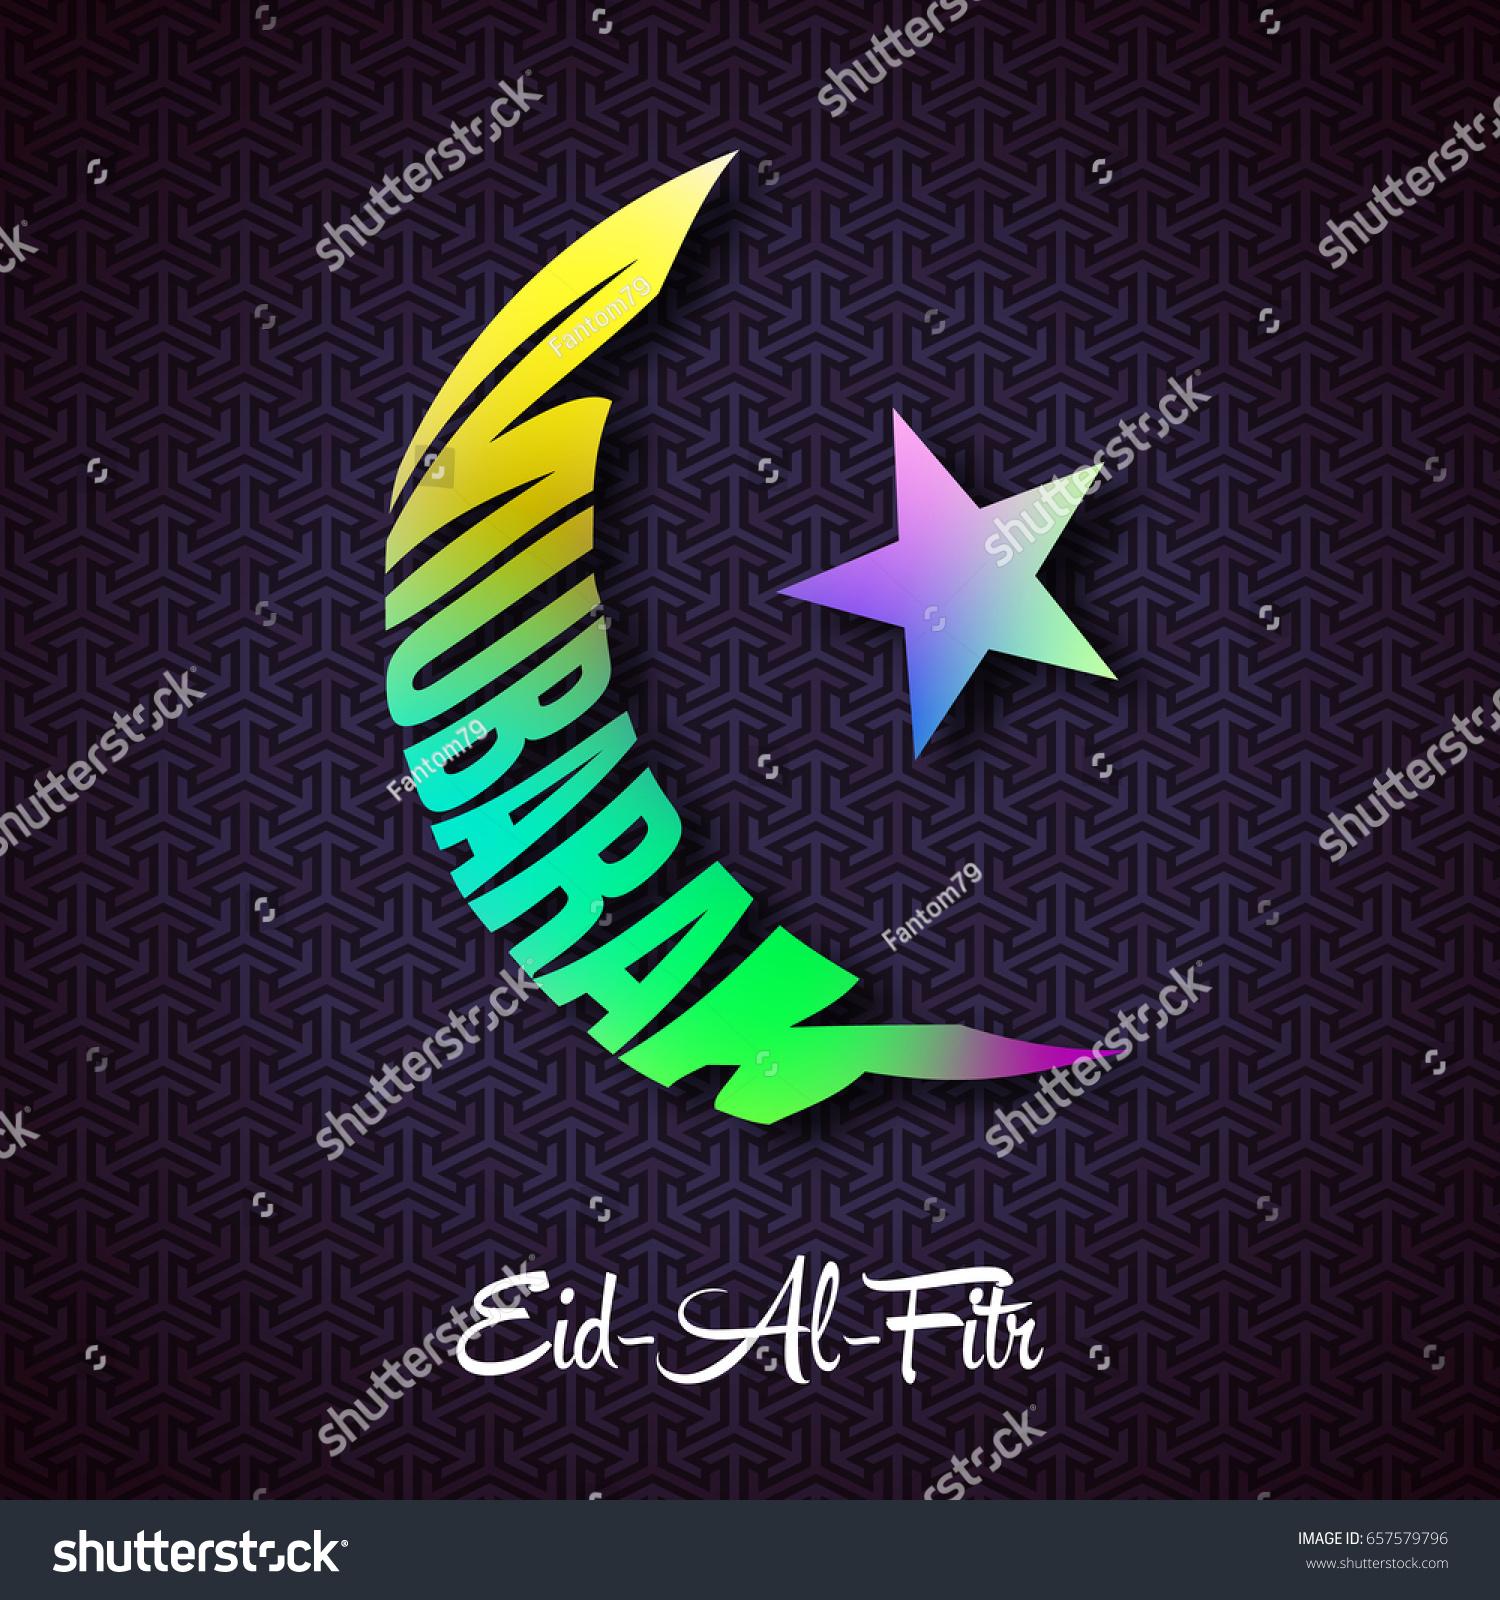 Wonderful Idd Eid Al-Fitr Greeting - stock-vector-eid-al-fitr-greeting-card-design-with-colorful-mubarak-in-form-of-half-moon-on-dark-blue-background-657579796  You Should Have_937848 .jpg